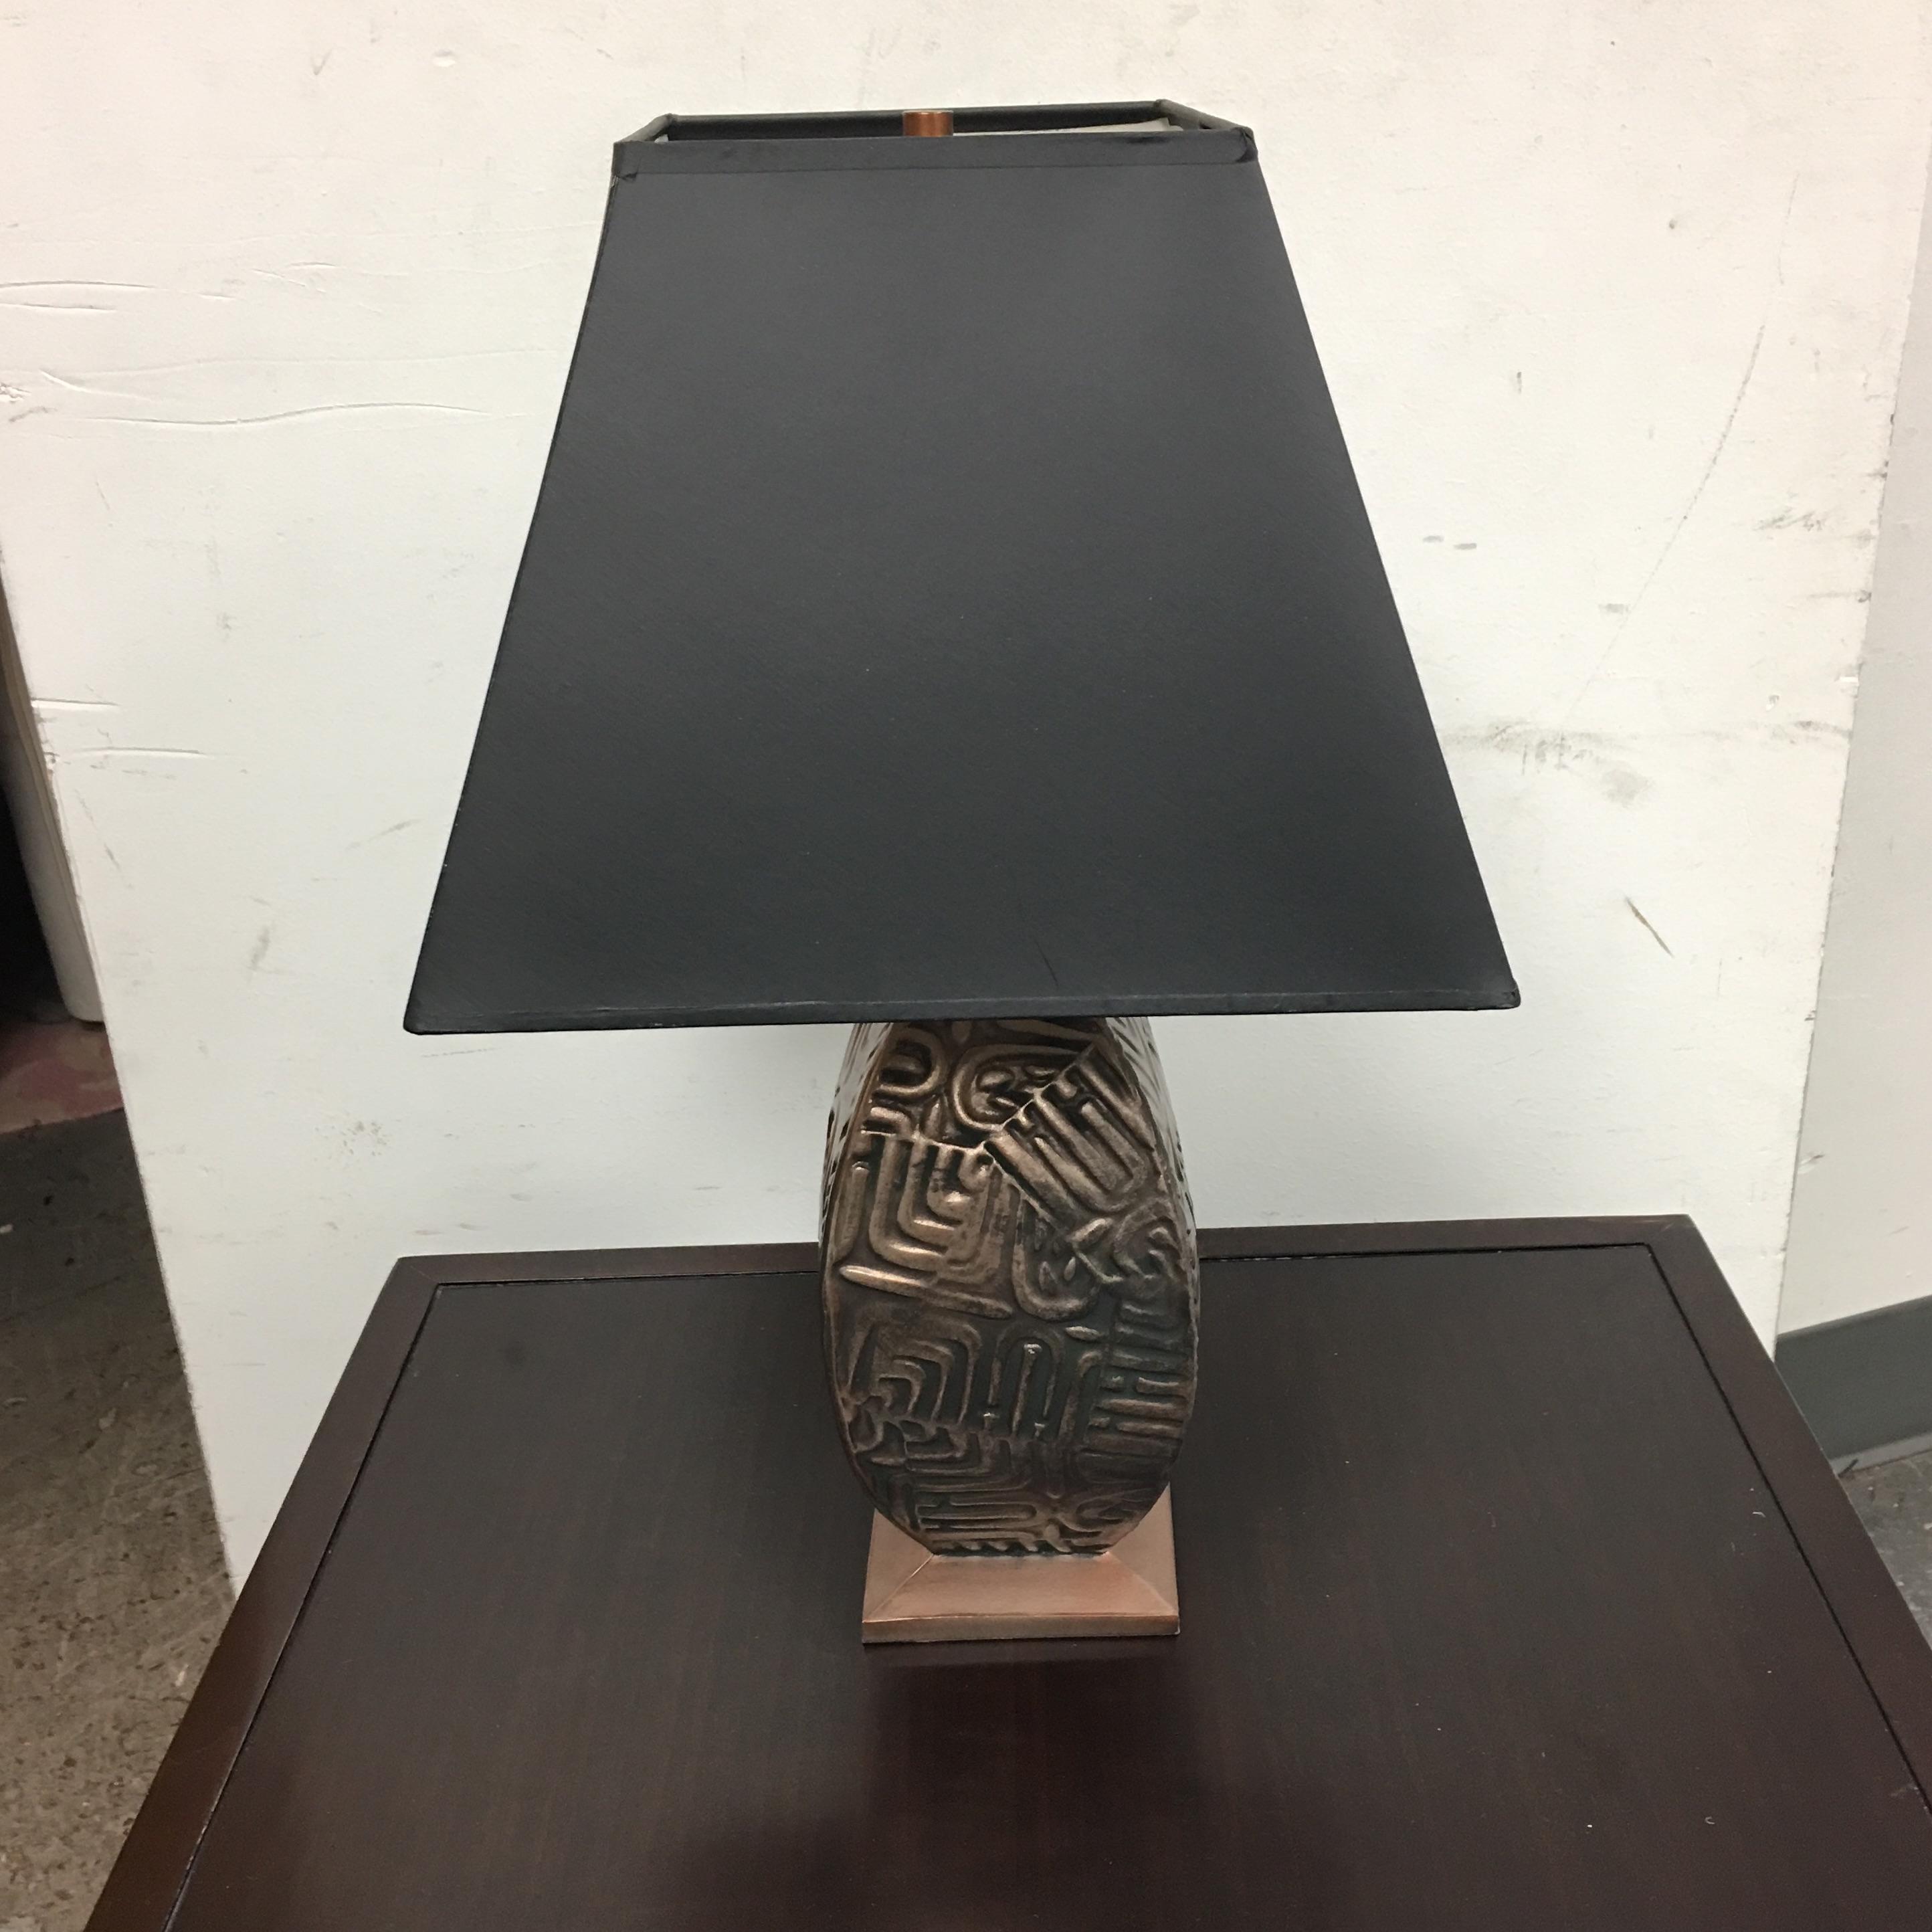 Gumps metal base table lamp image 4